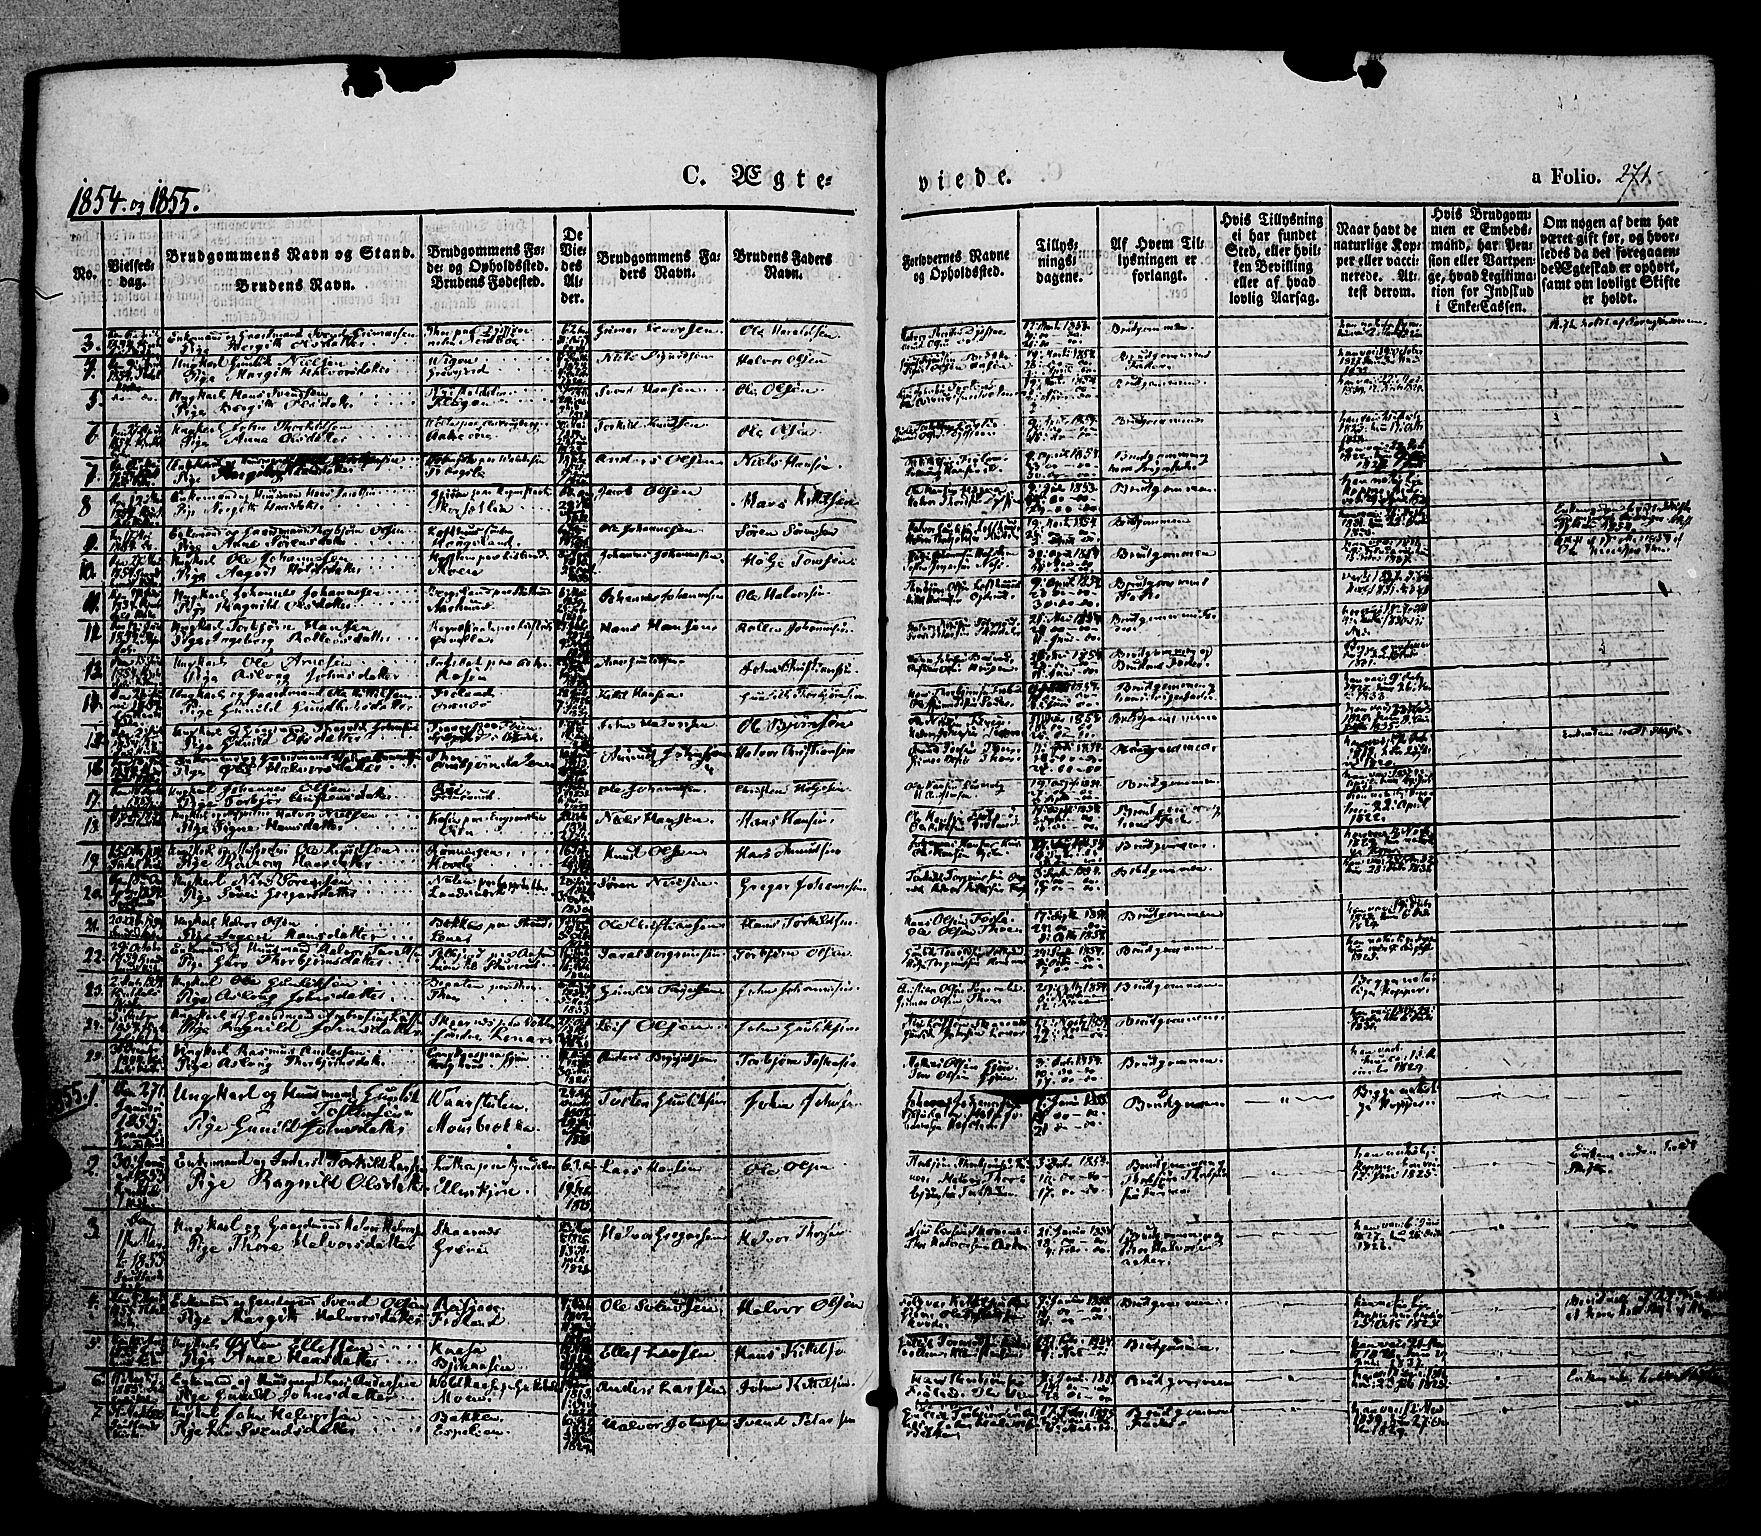 SAKO, Hjartdal kirkebøker, F/Fa/L0008: Ministerialbok nr. I 8, 1844-1859, s. 271